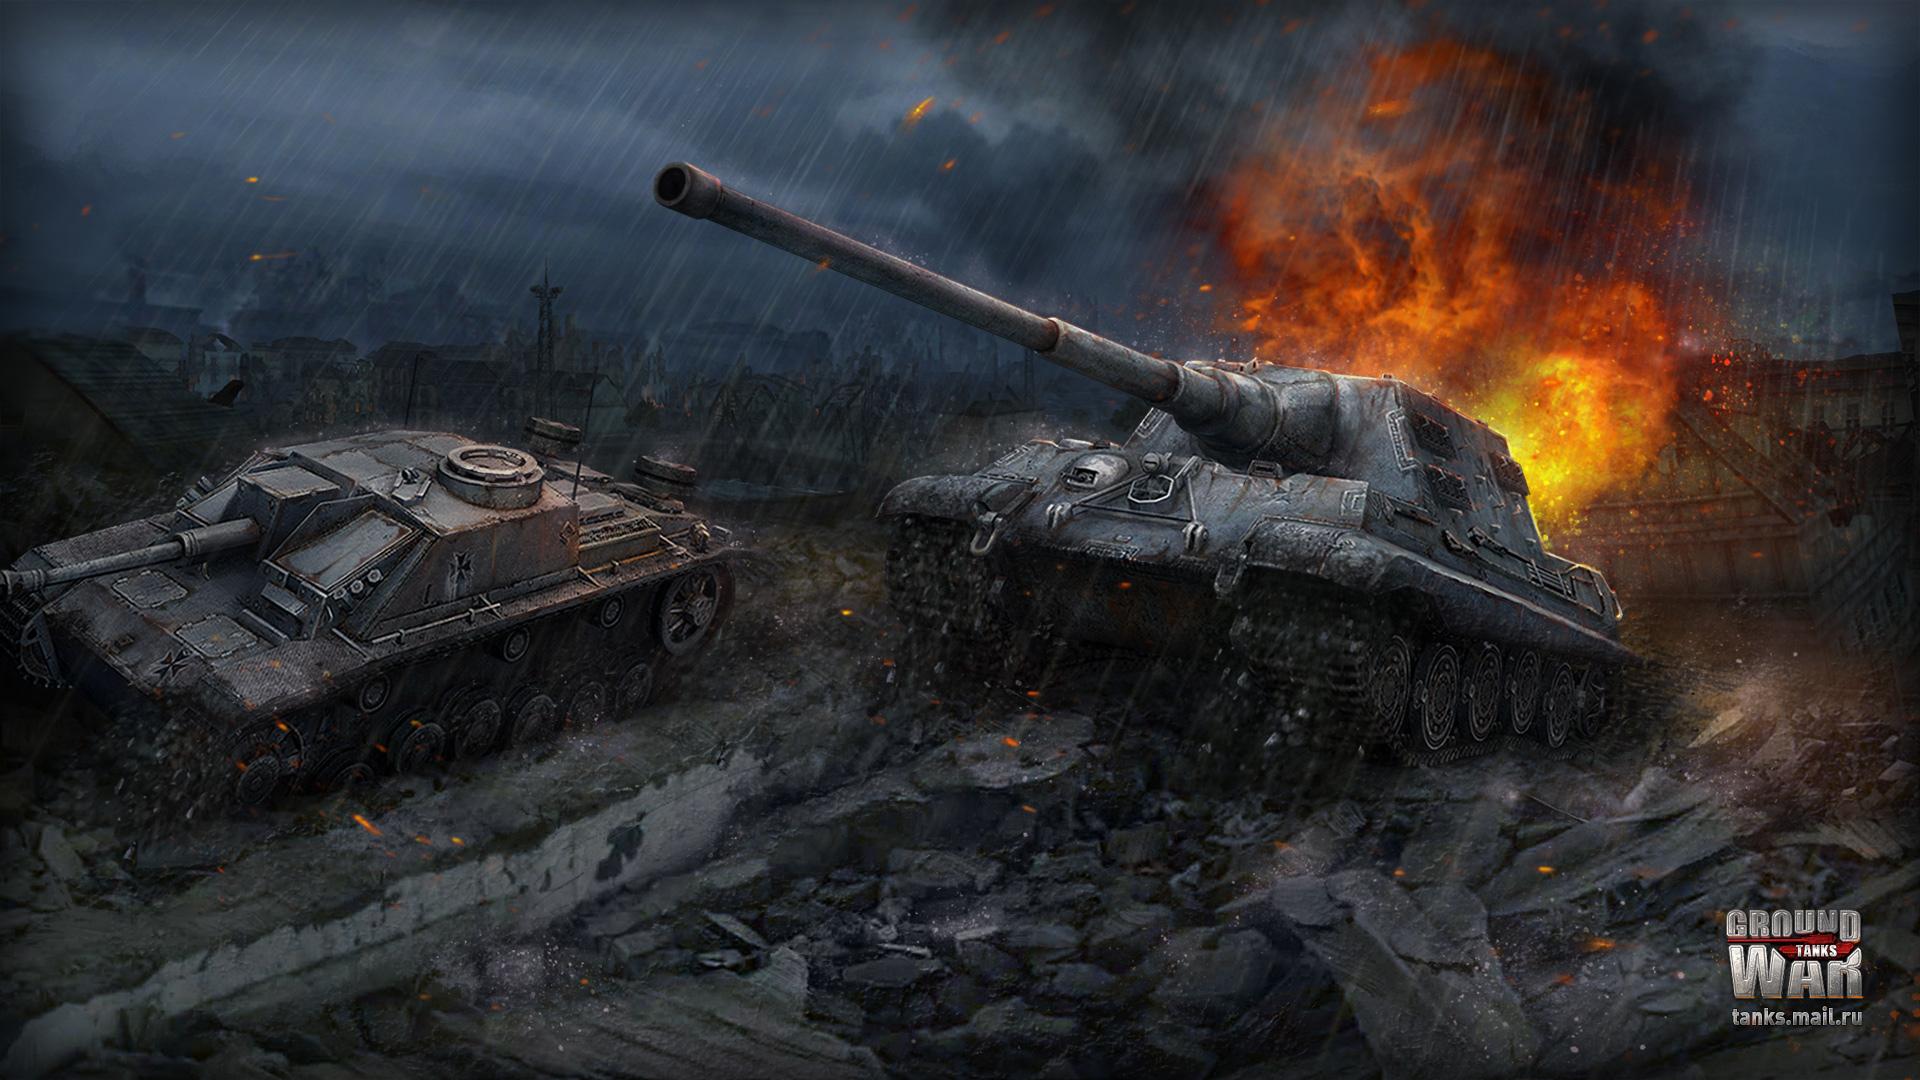 world of tanks обои на рабочий стол ис 4